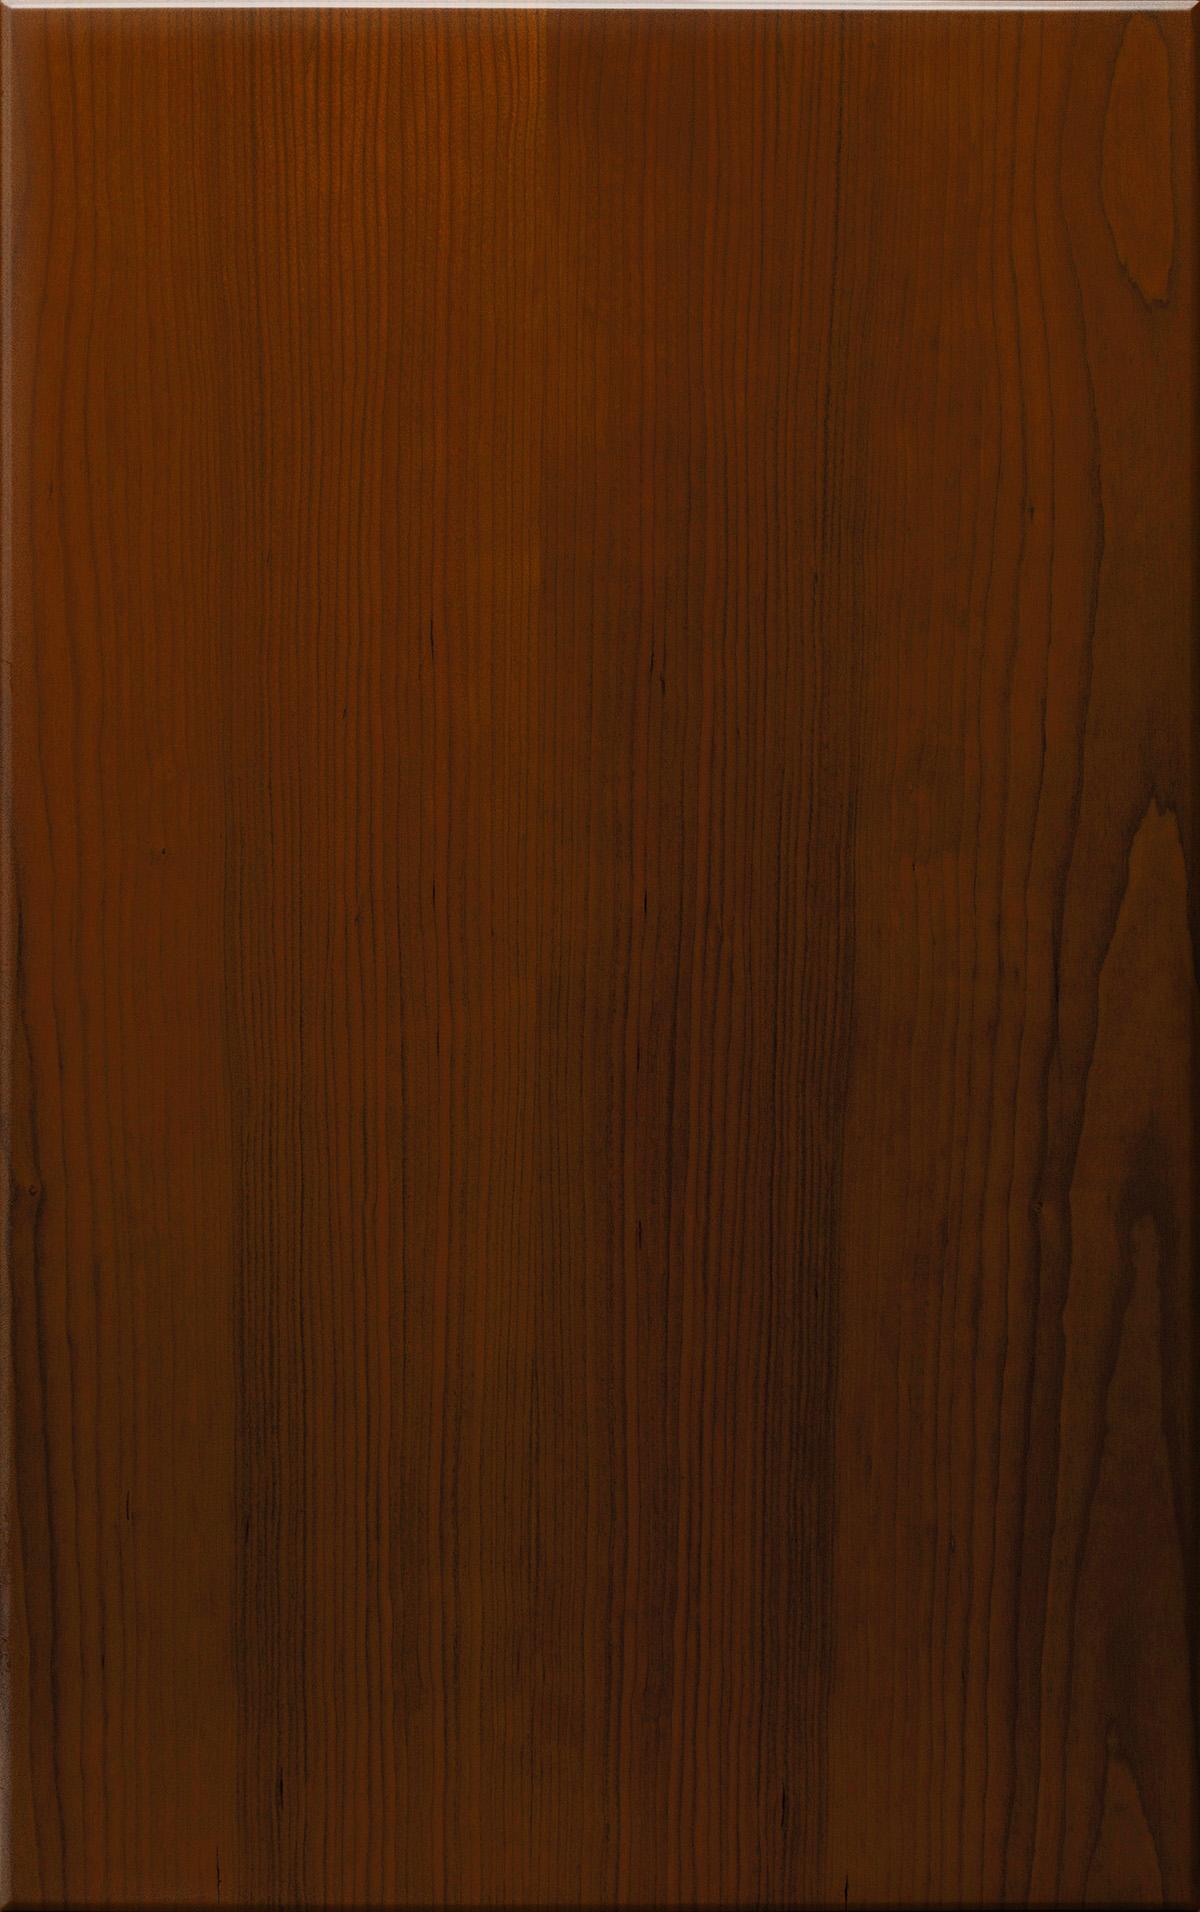 Cinnamon (Cherry)